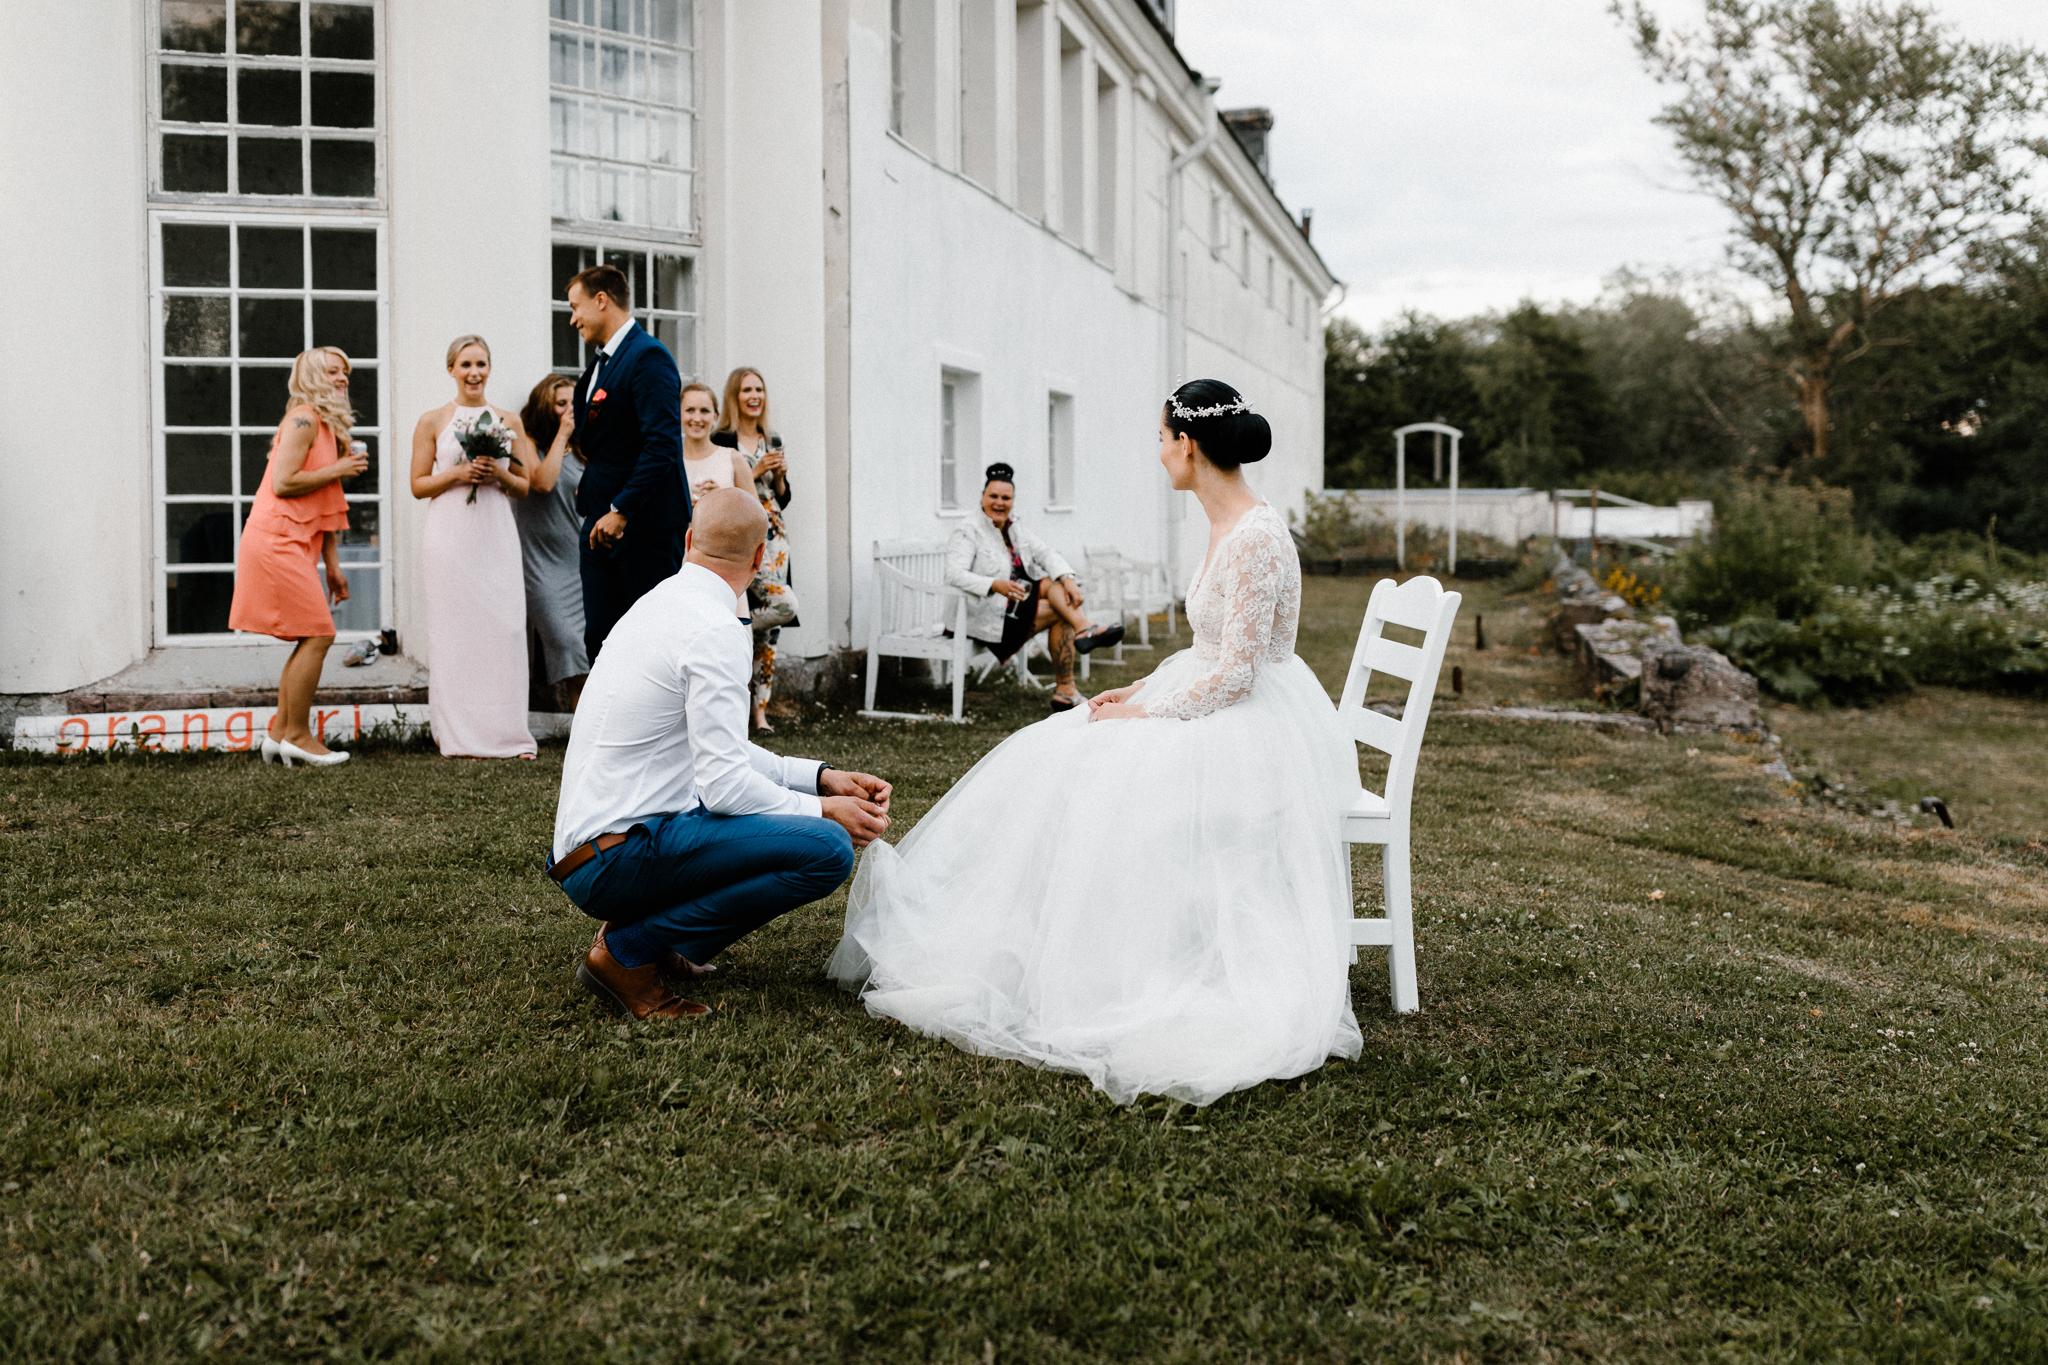 Essi + Ville   Oitbacka Gården   by Patrick Karkkolainen Wedding Photography-313.jpg